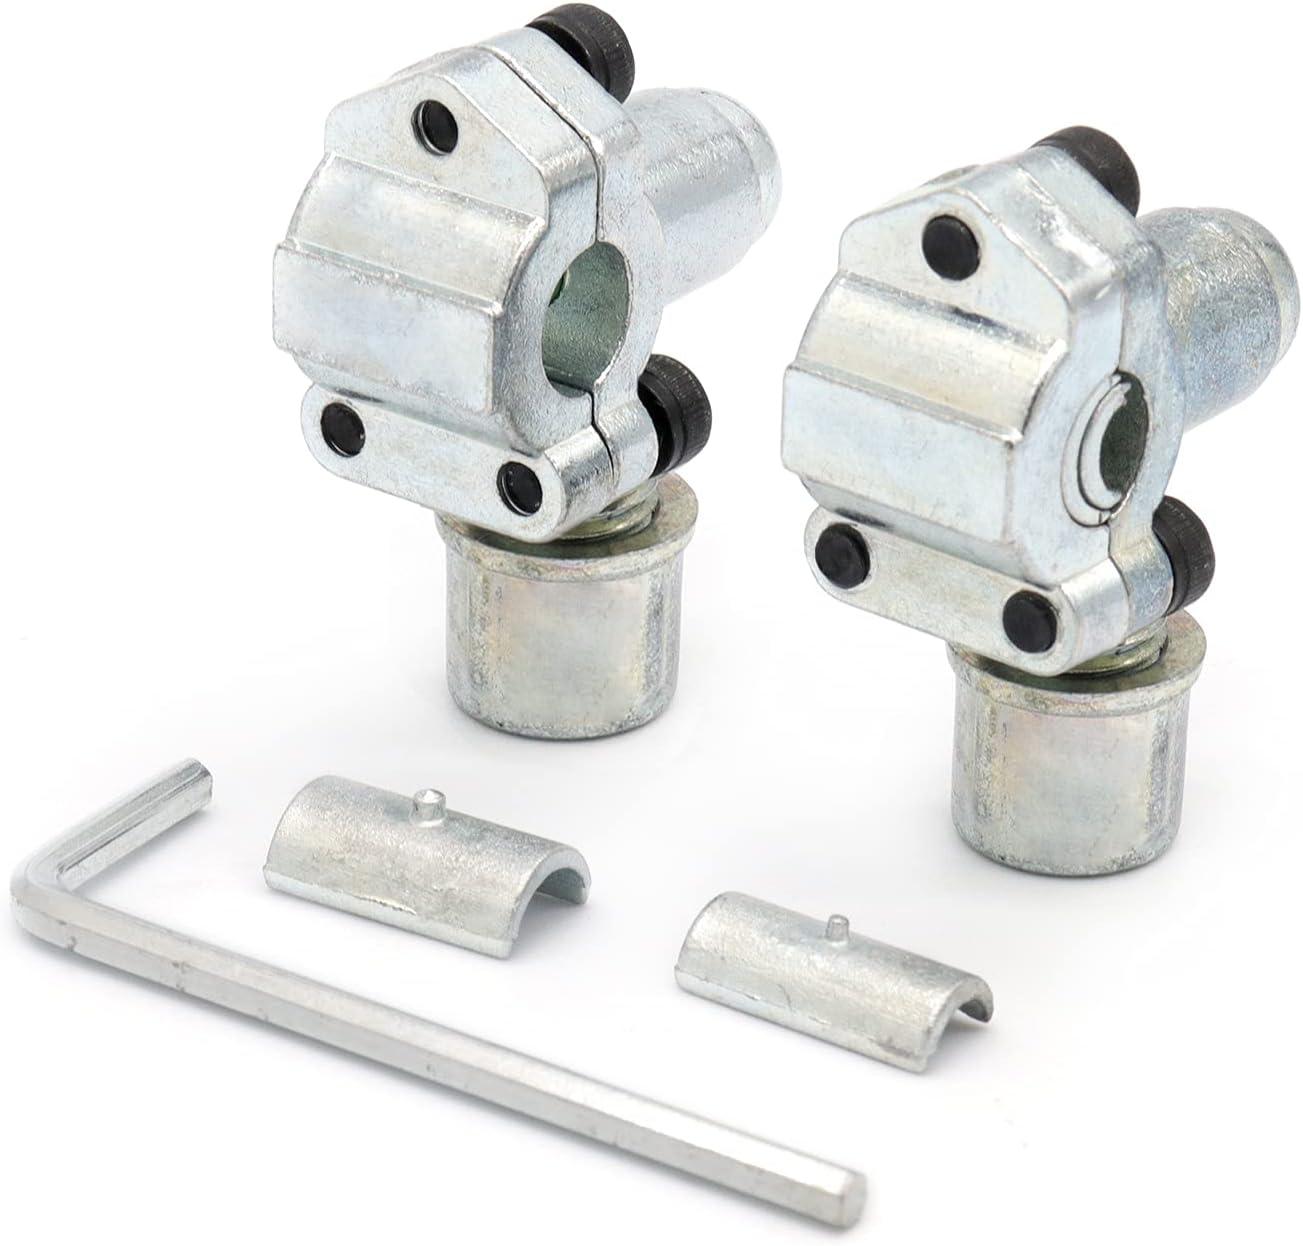 RUIZHI 2pcs Kit de Válvula de Grifo Perforadora de Bala BPV-31 Válvula Ajustable Bullet Piercing Tap Valve para Acondicionadores de Aire Tubos de 1/4, 5/16, 3/8 Pulgadas